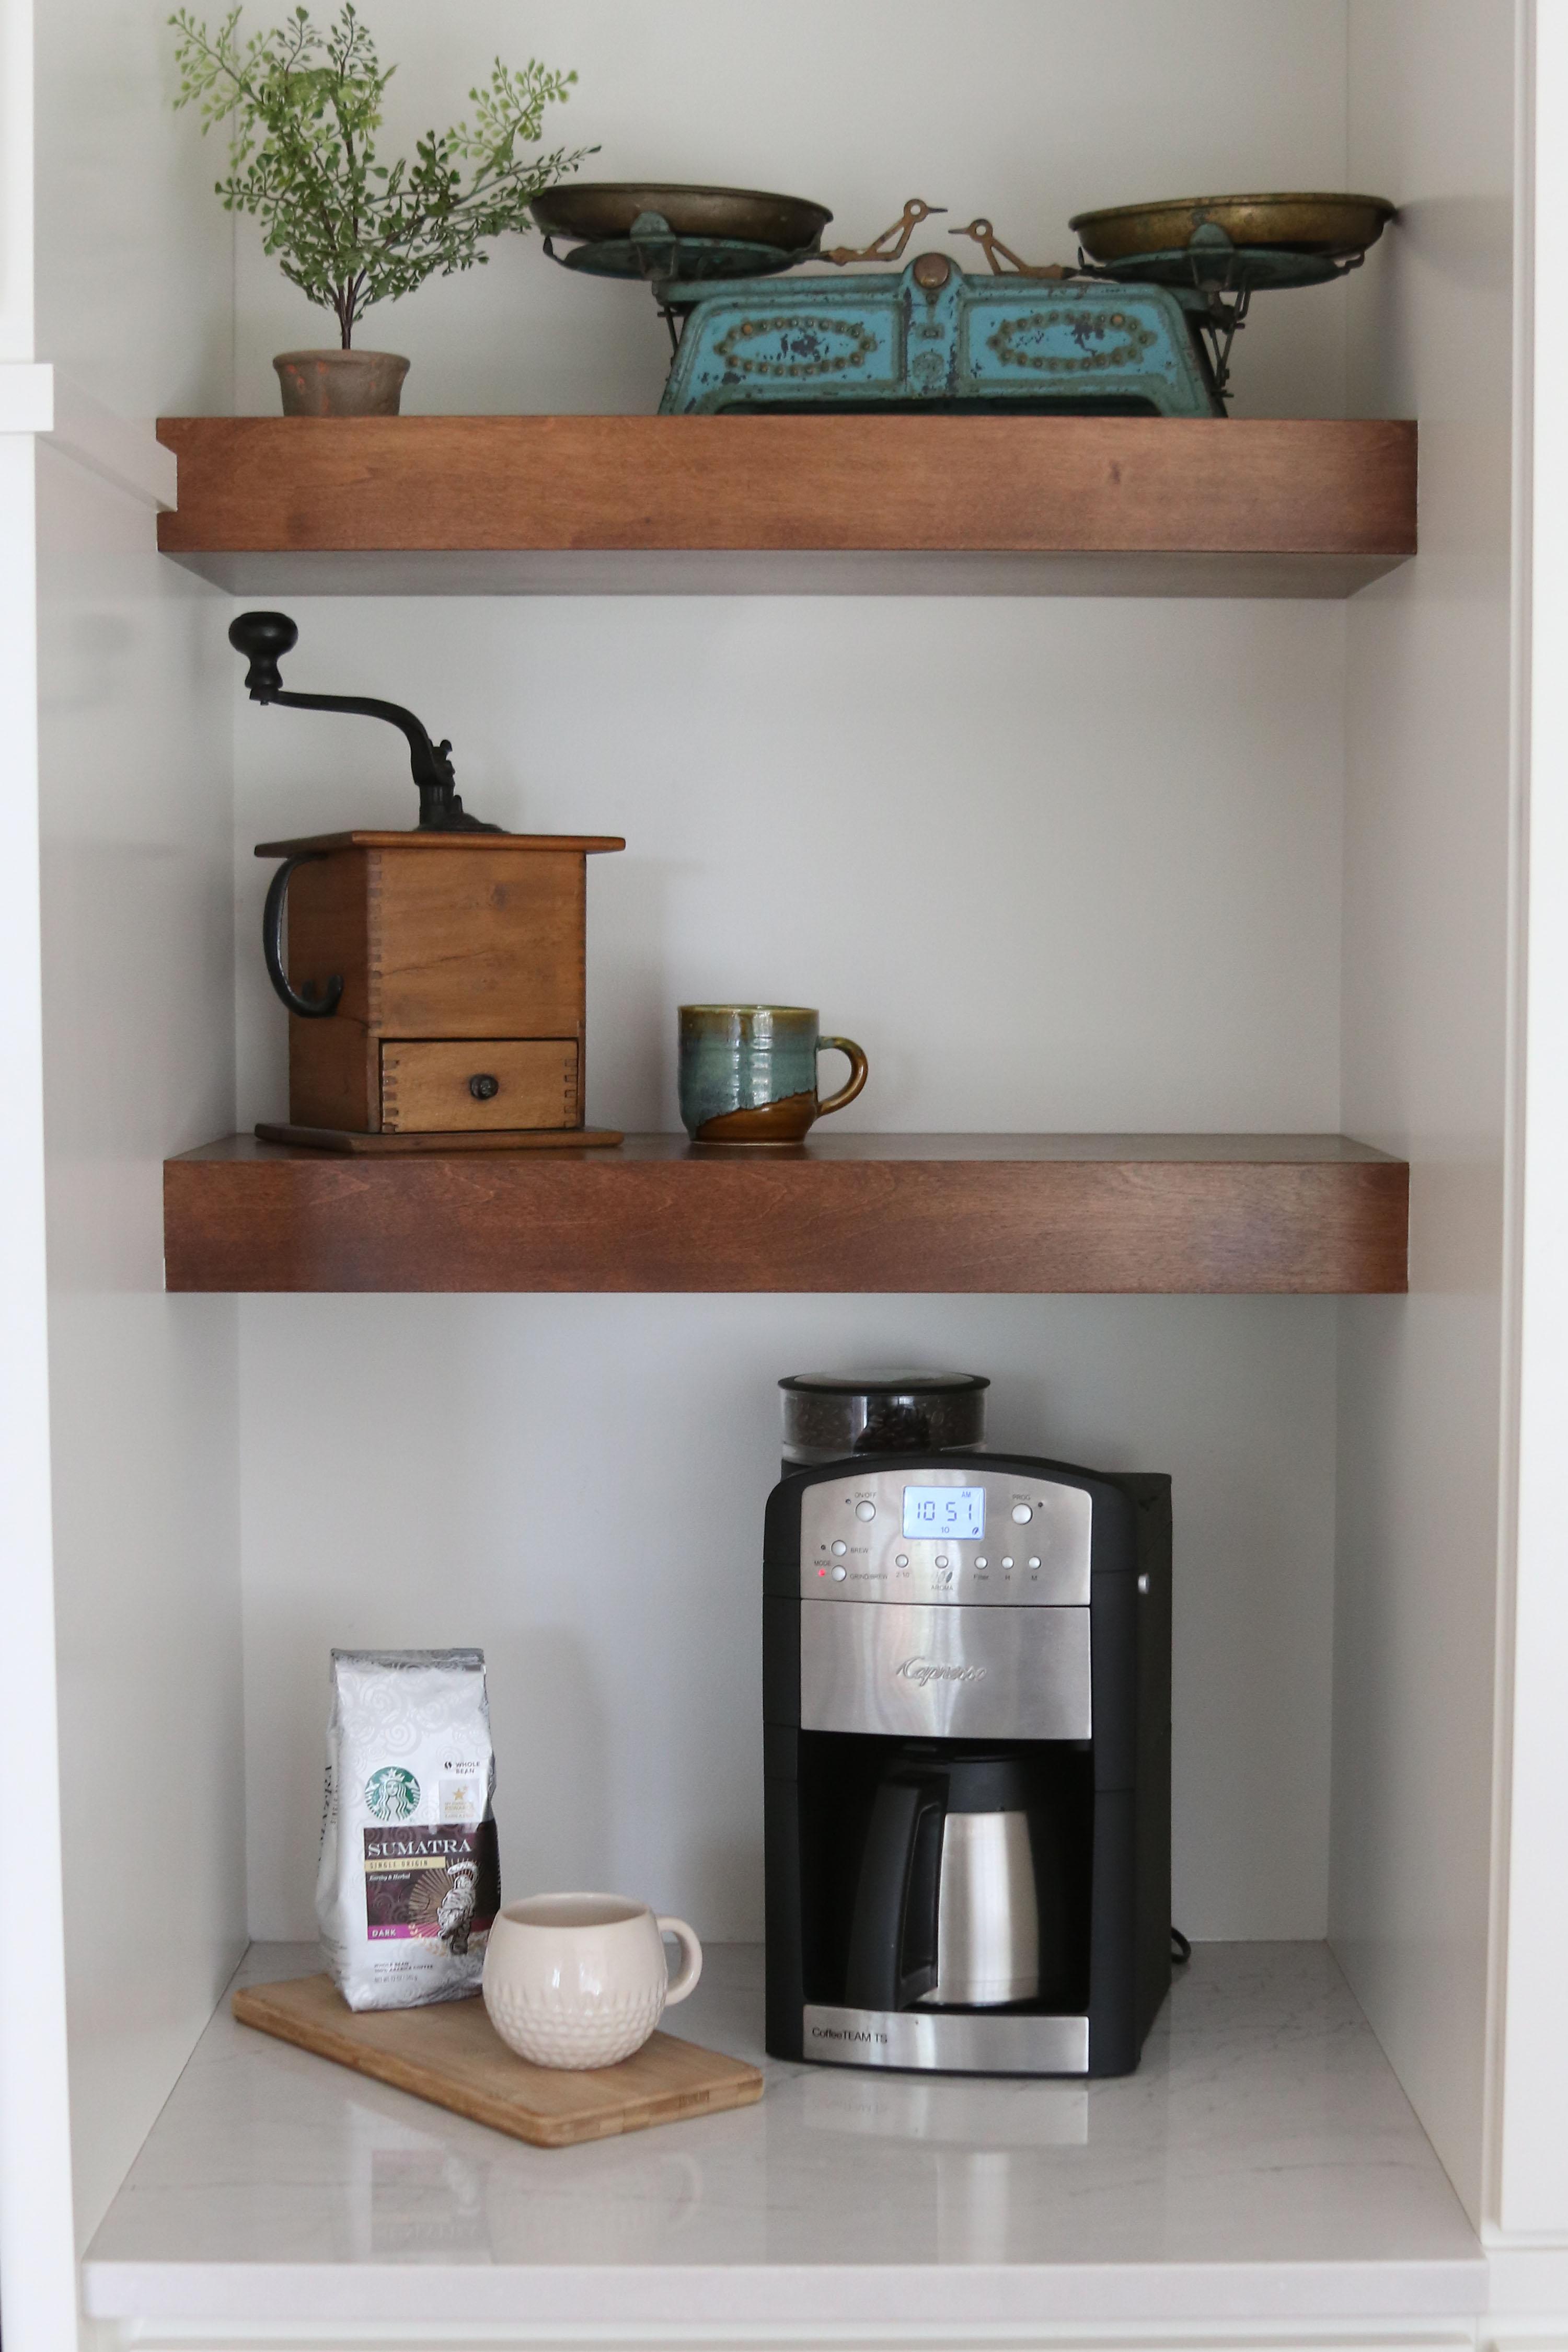 Morning Coffee Espresso And